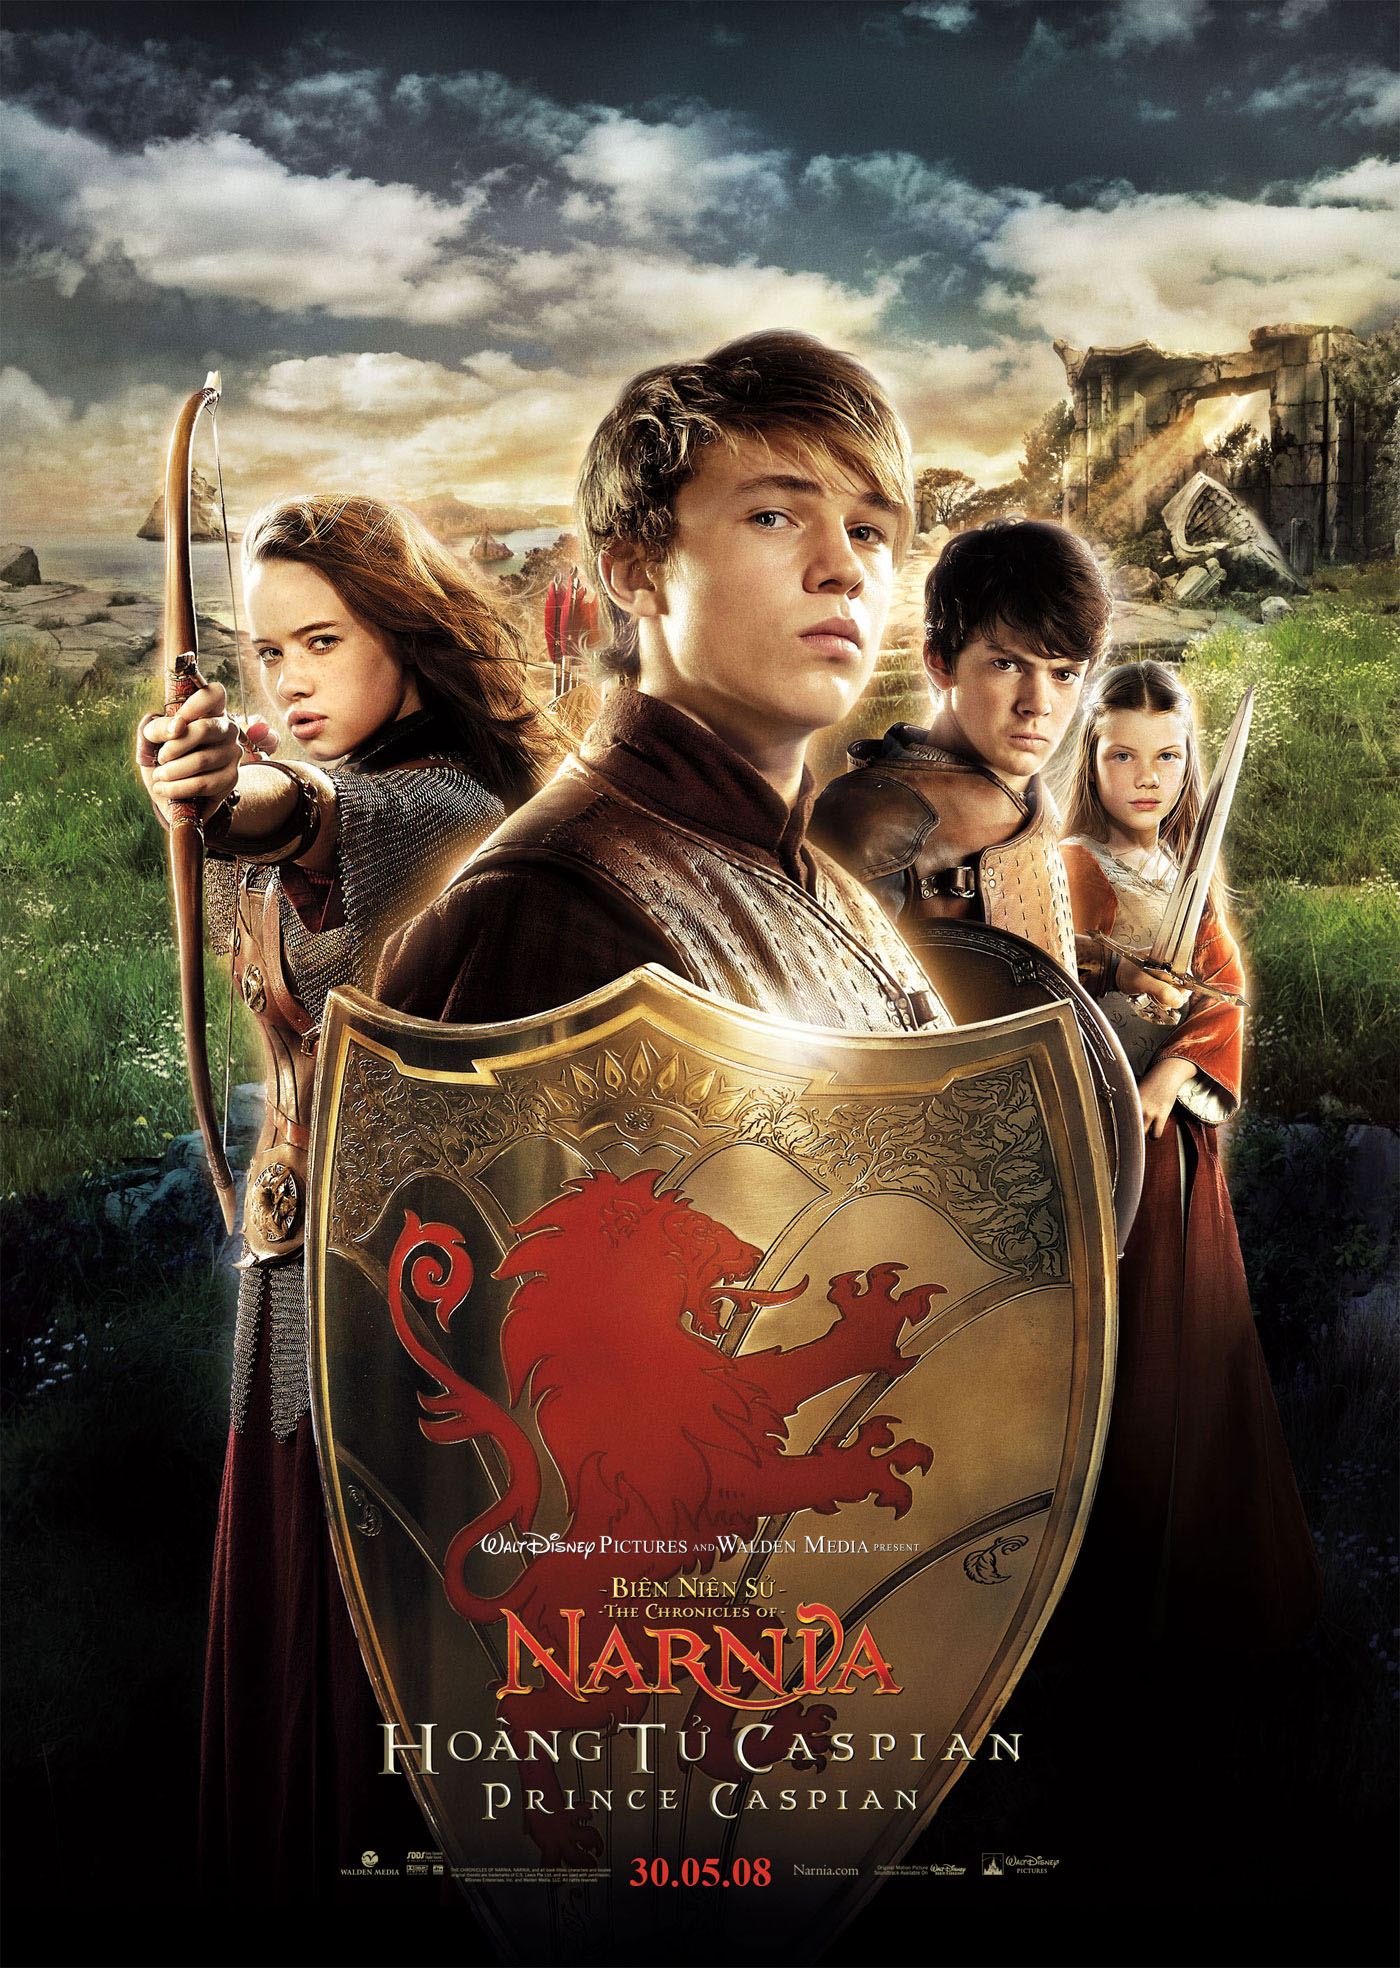 http://www.elbakin.net/plume/xmedia/fantasy/news/narnia/prince-caspian/affiches/chroniclesofnarnia2_8.jpg